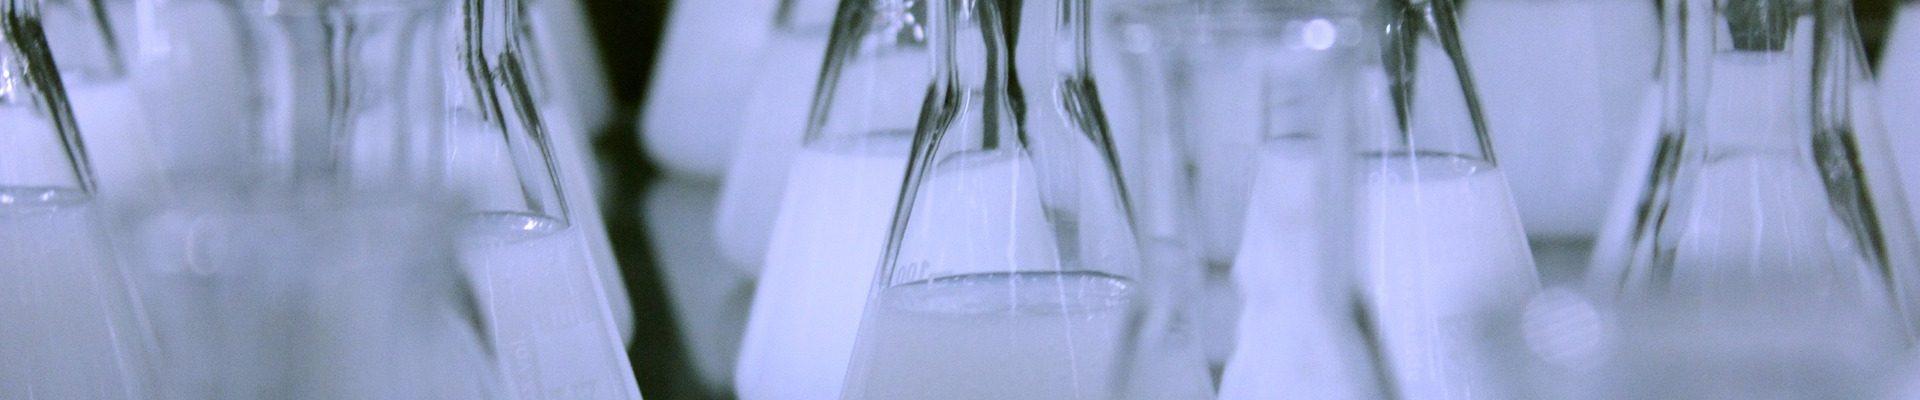 flasks-606612_1920